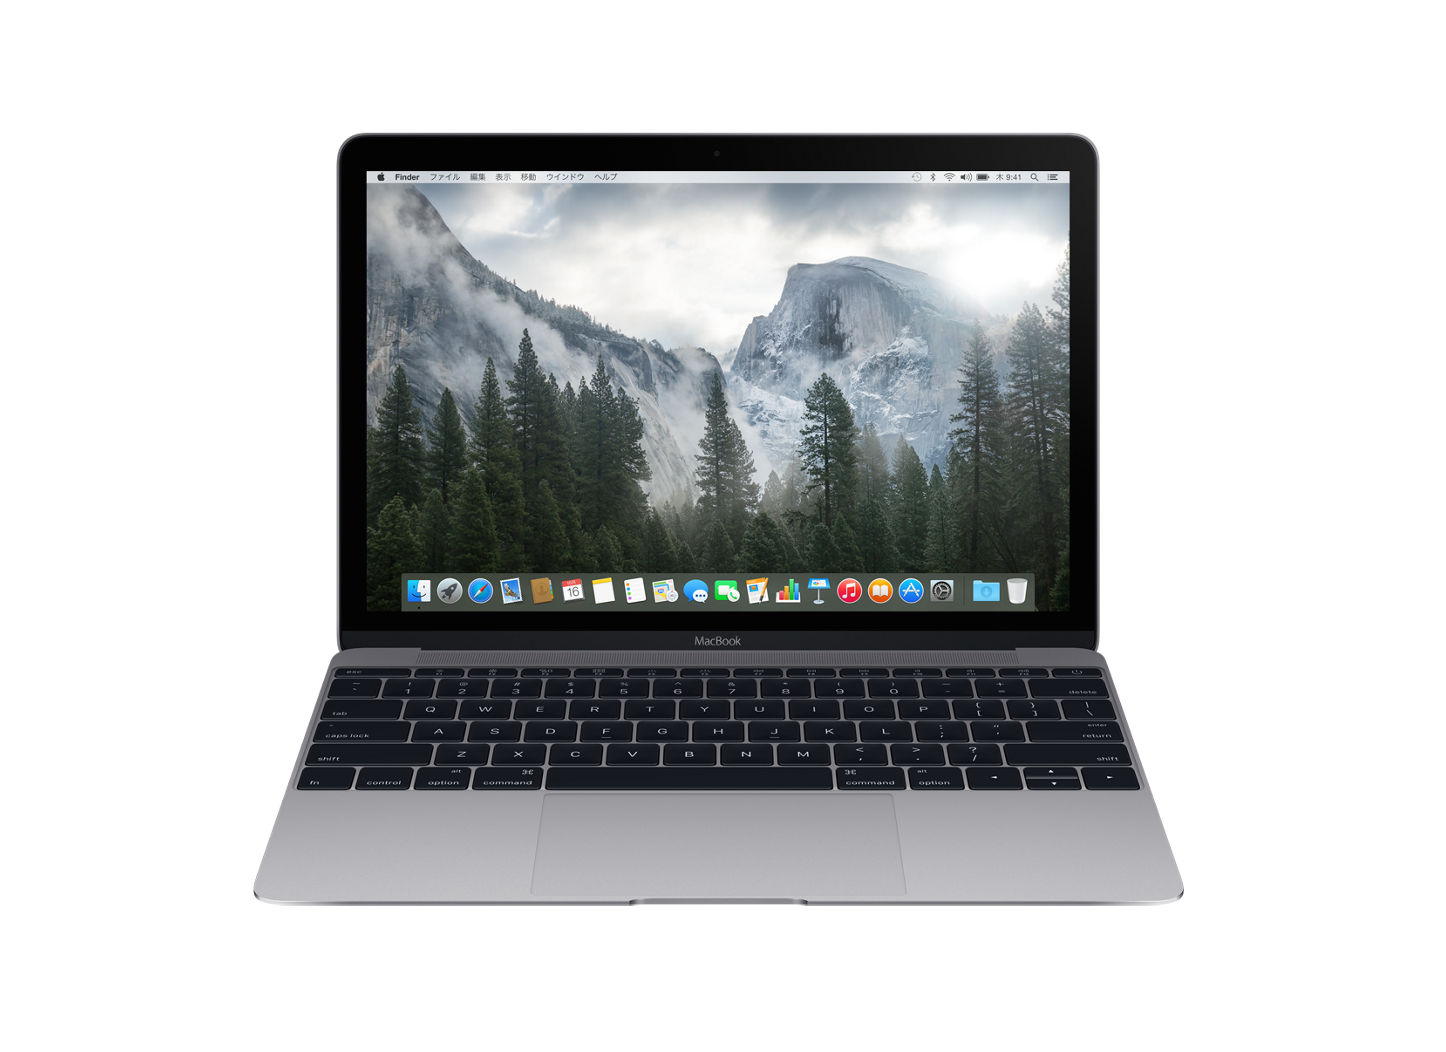 macbook-space-gray.png